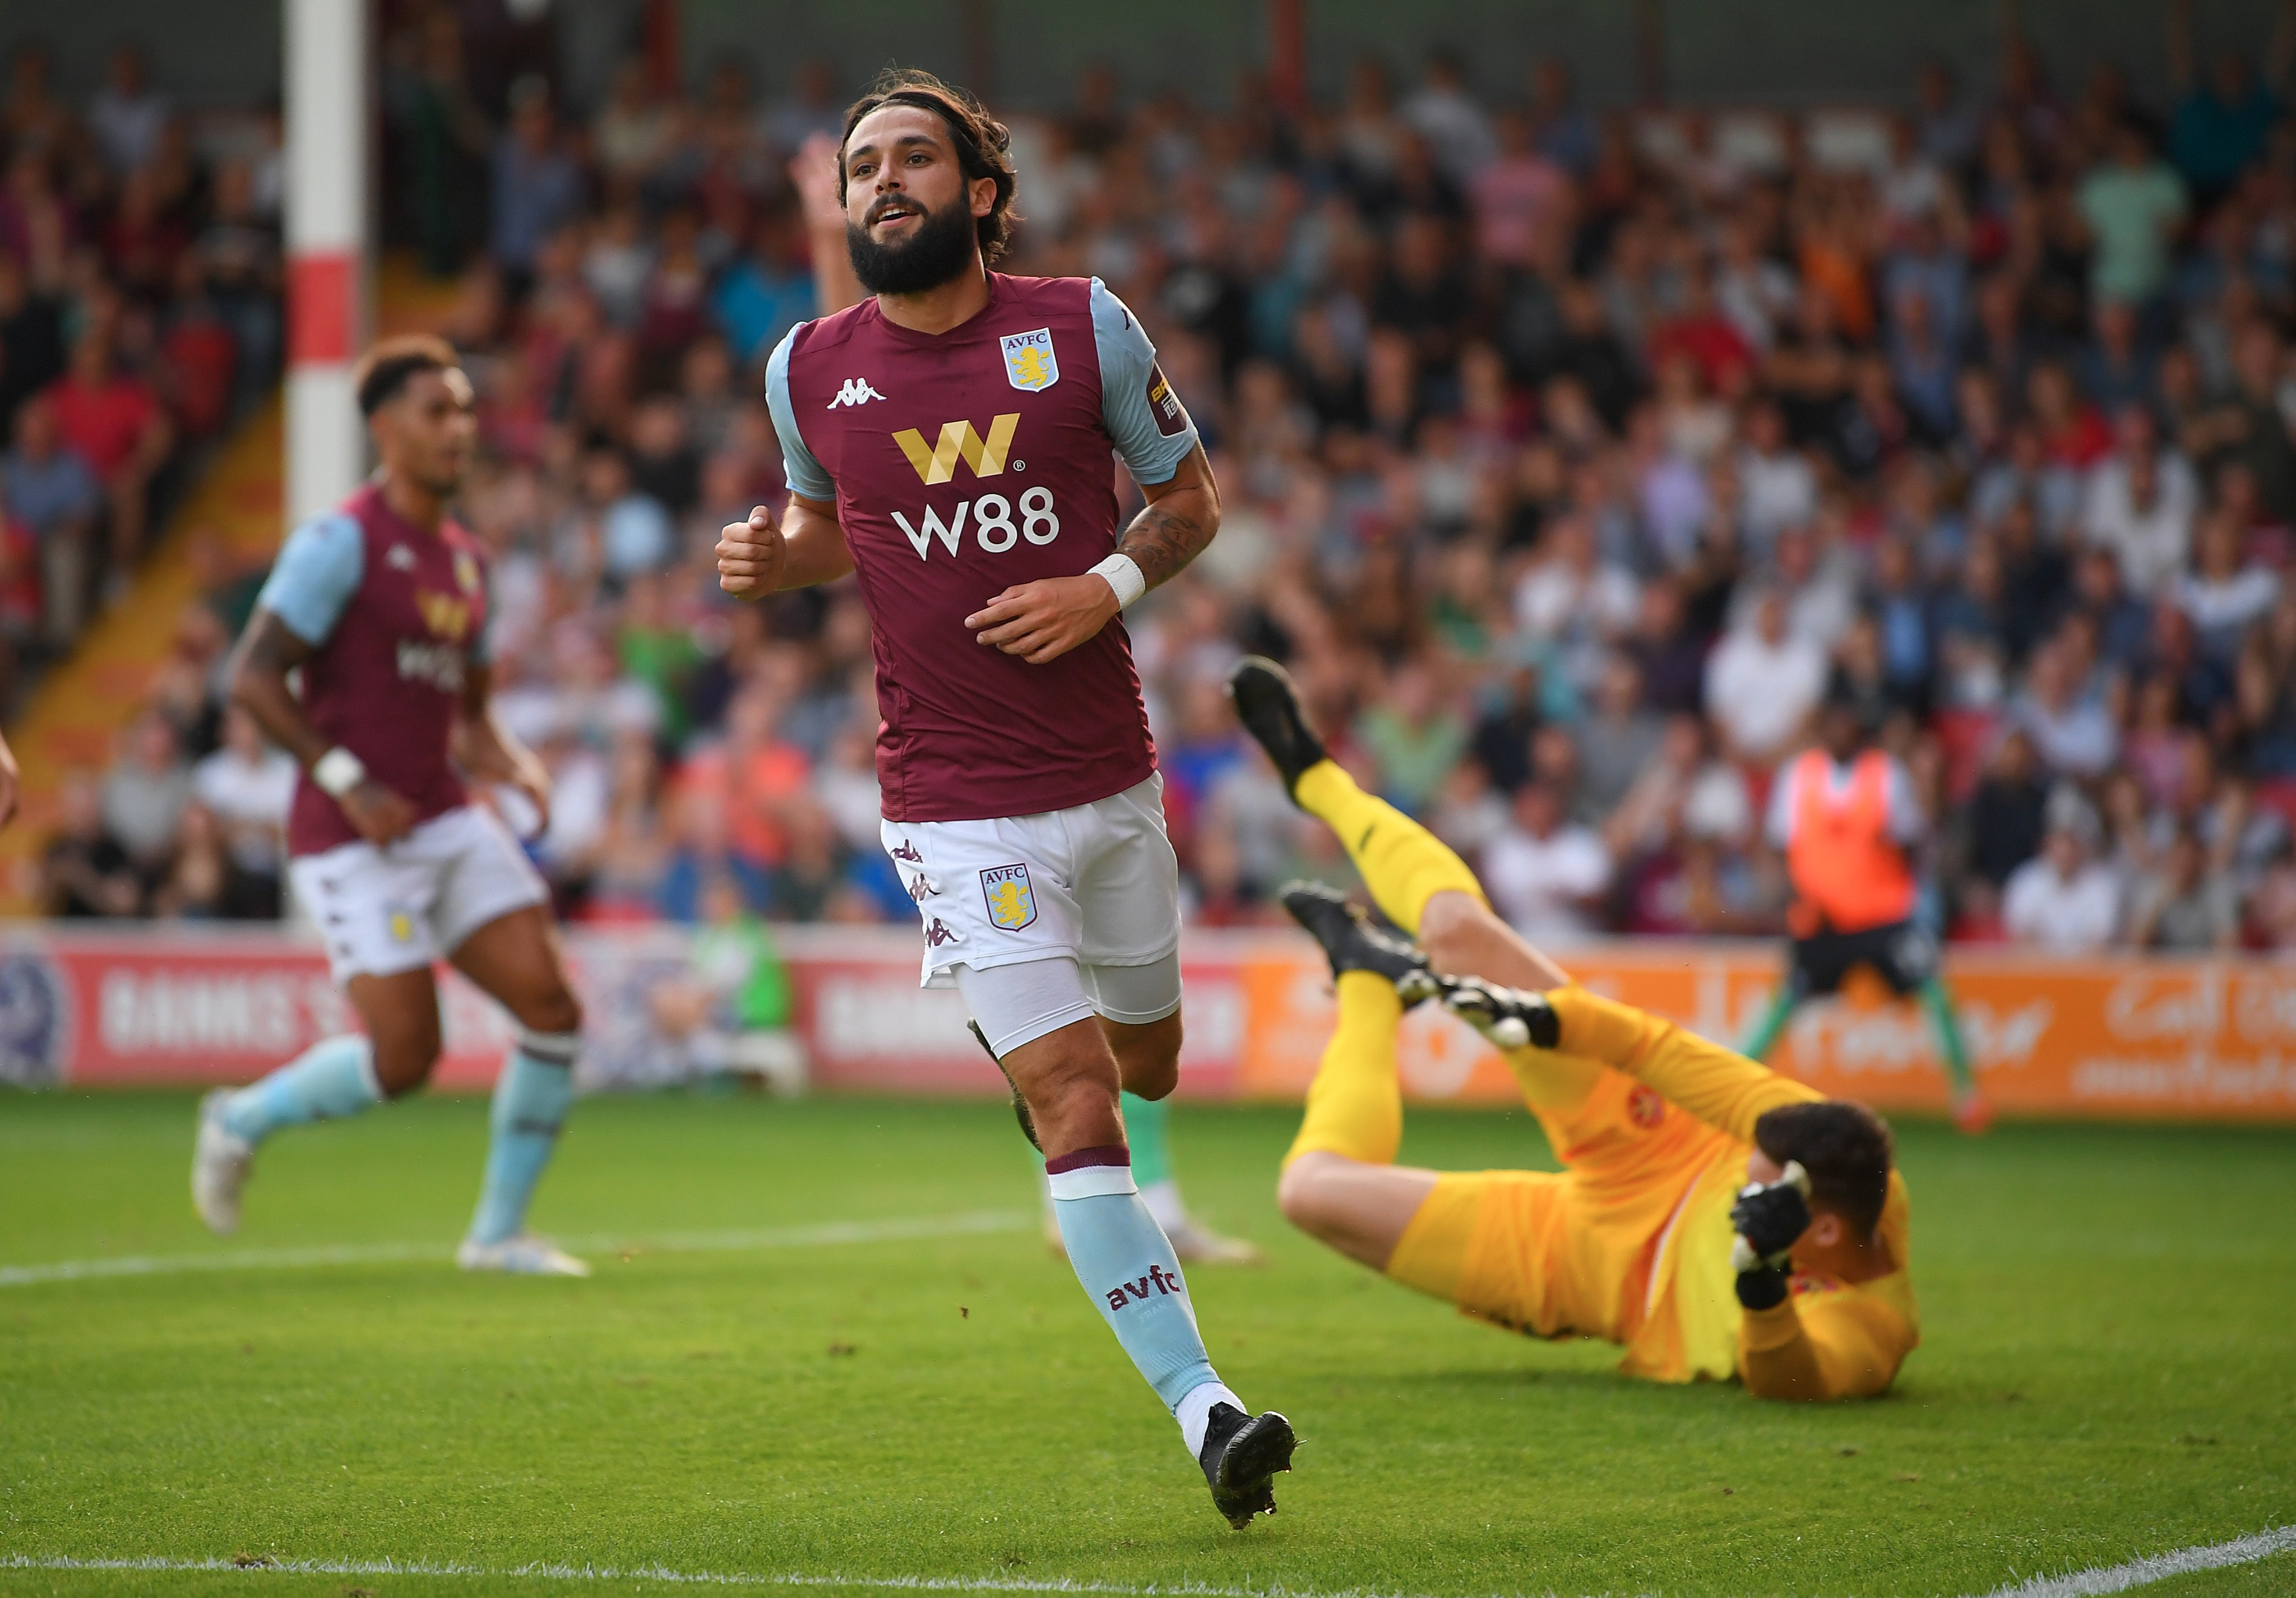 Jota Brace at Walsall Friendly for Aston Villa